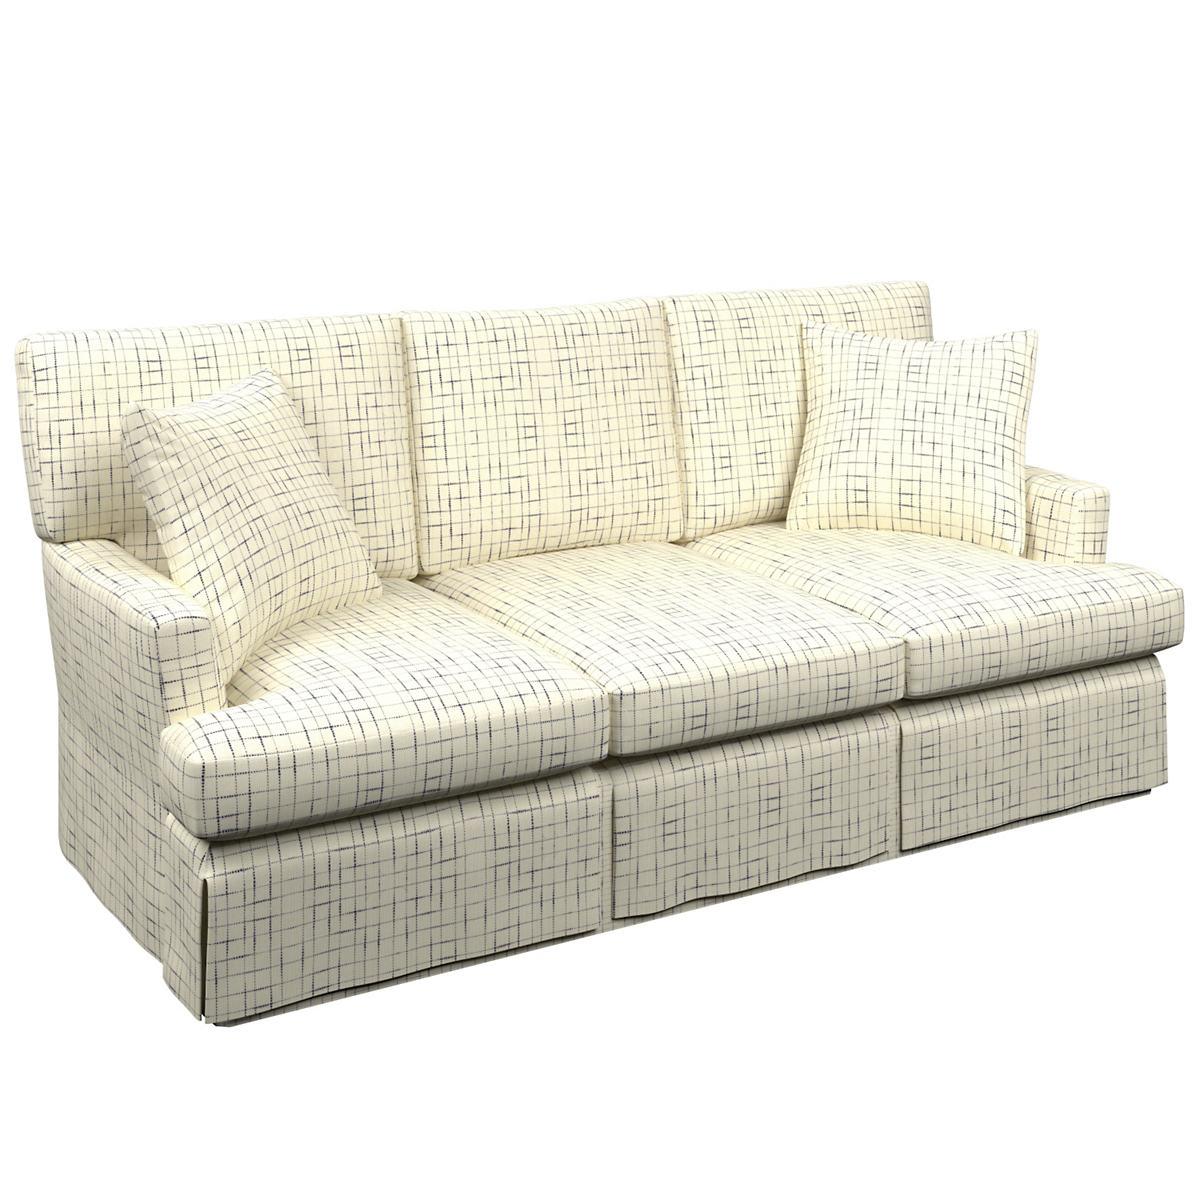 Nicholson Indigo Saybrook 3 Seater Slipcovered Sofa